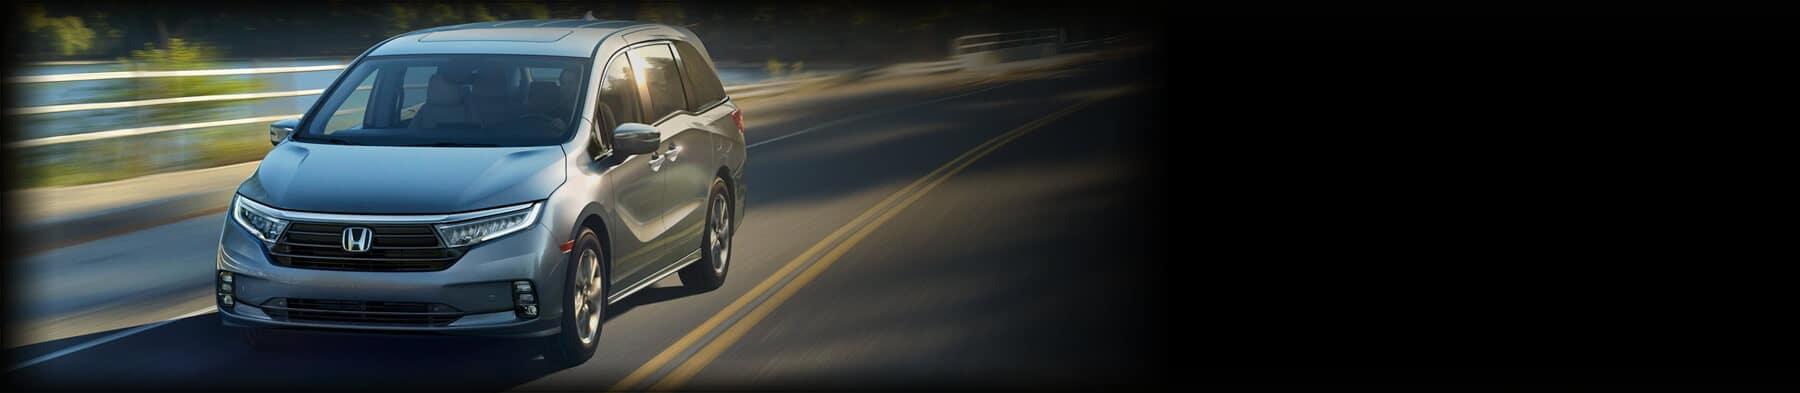 Honda Odyssey Awards Hero Image